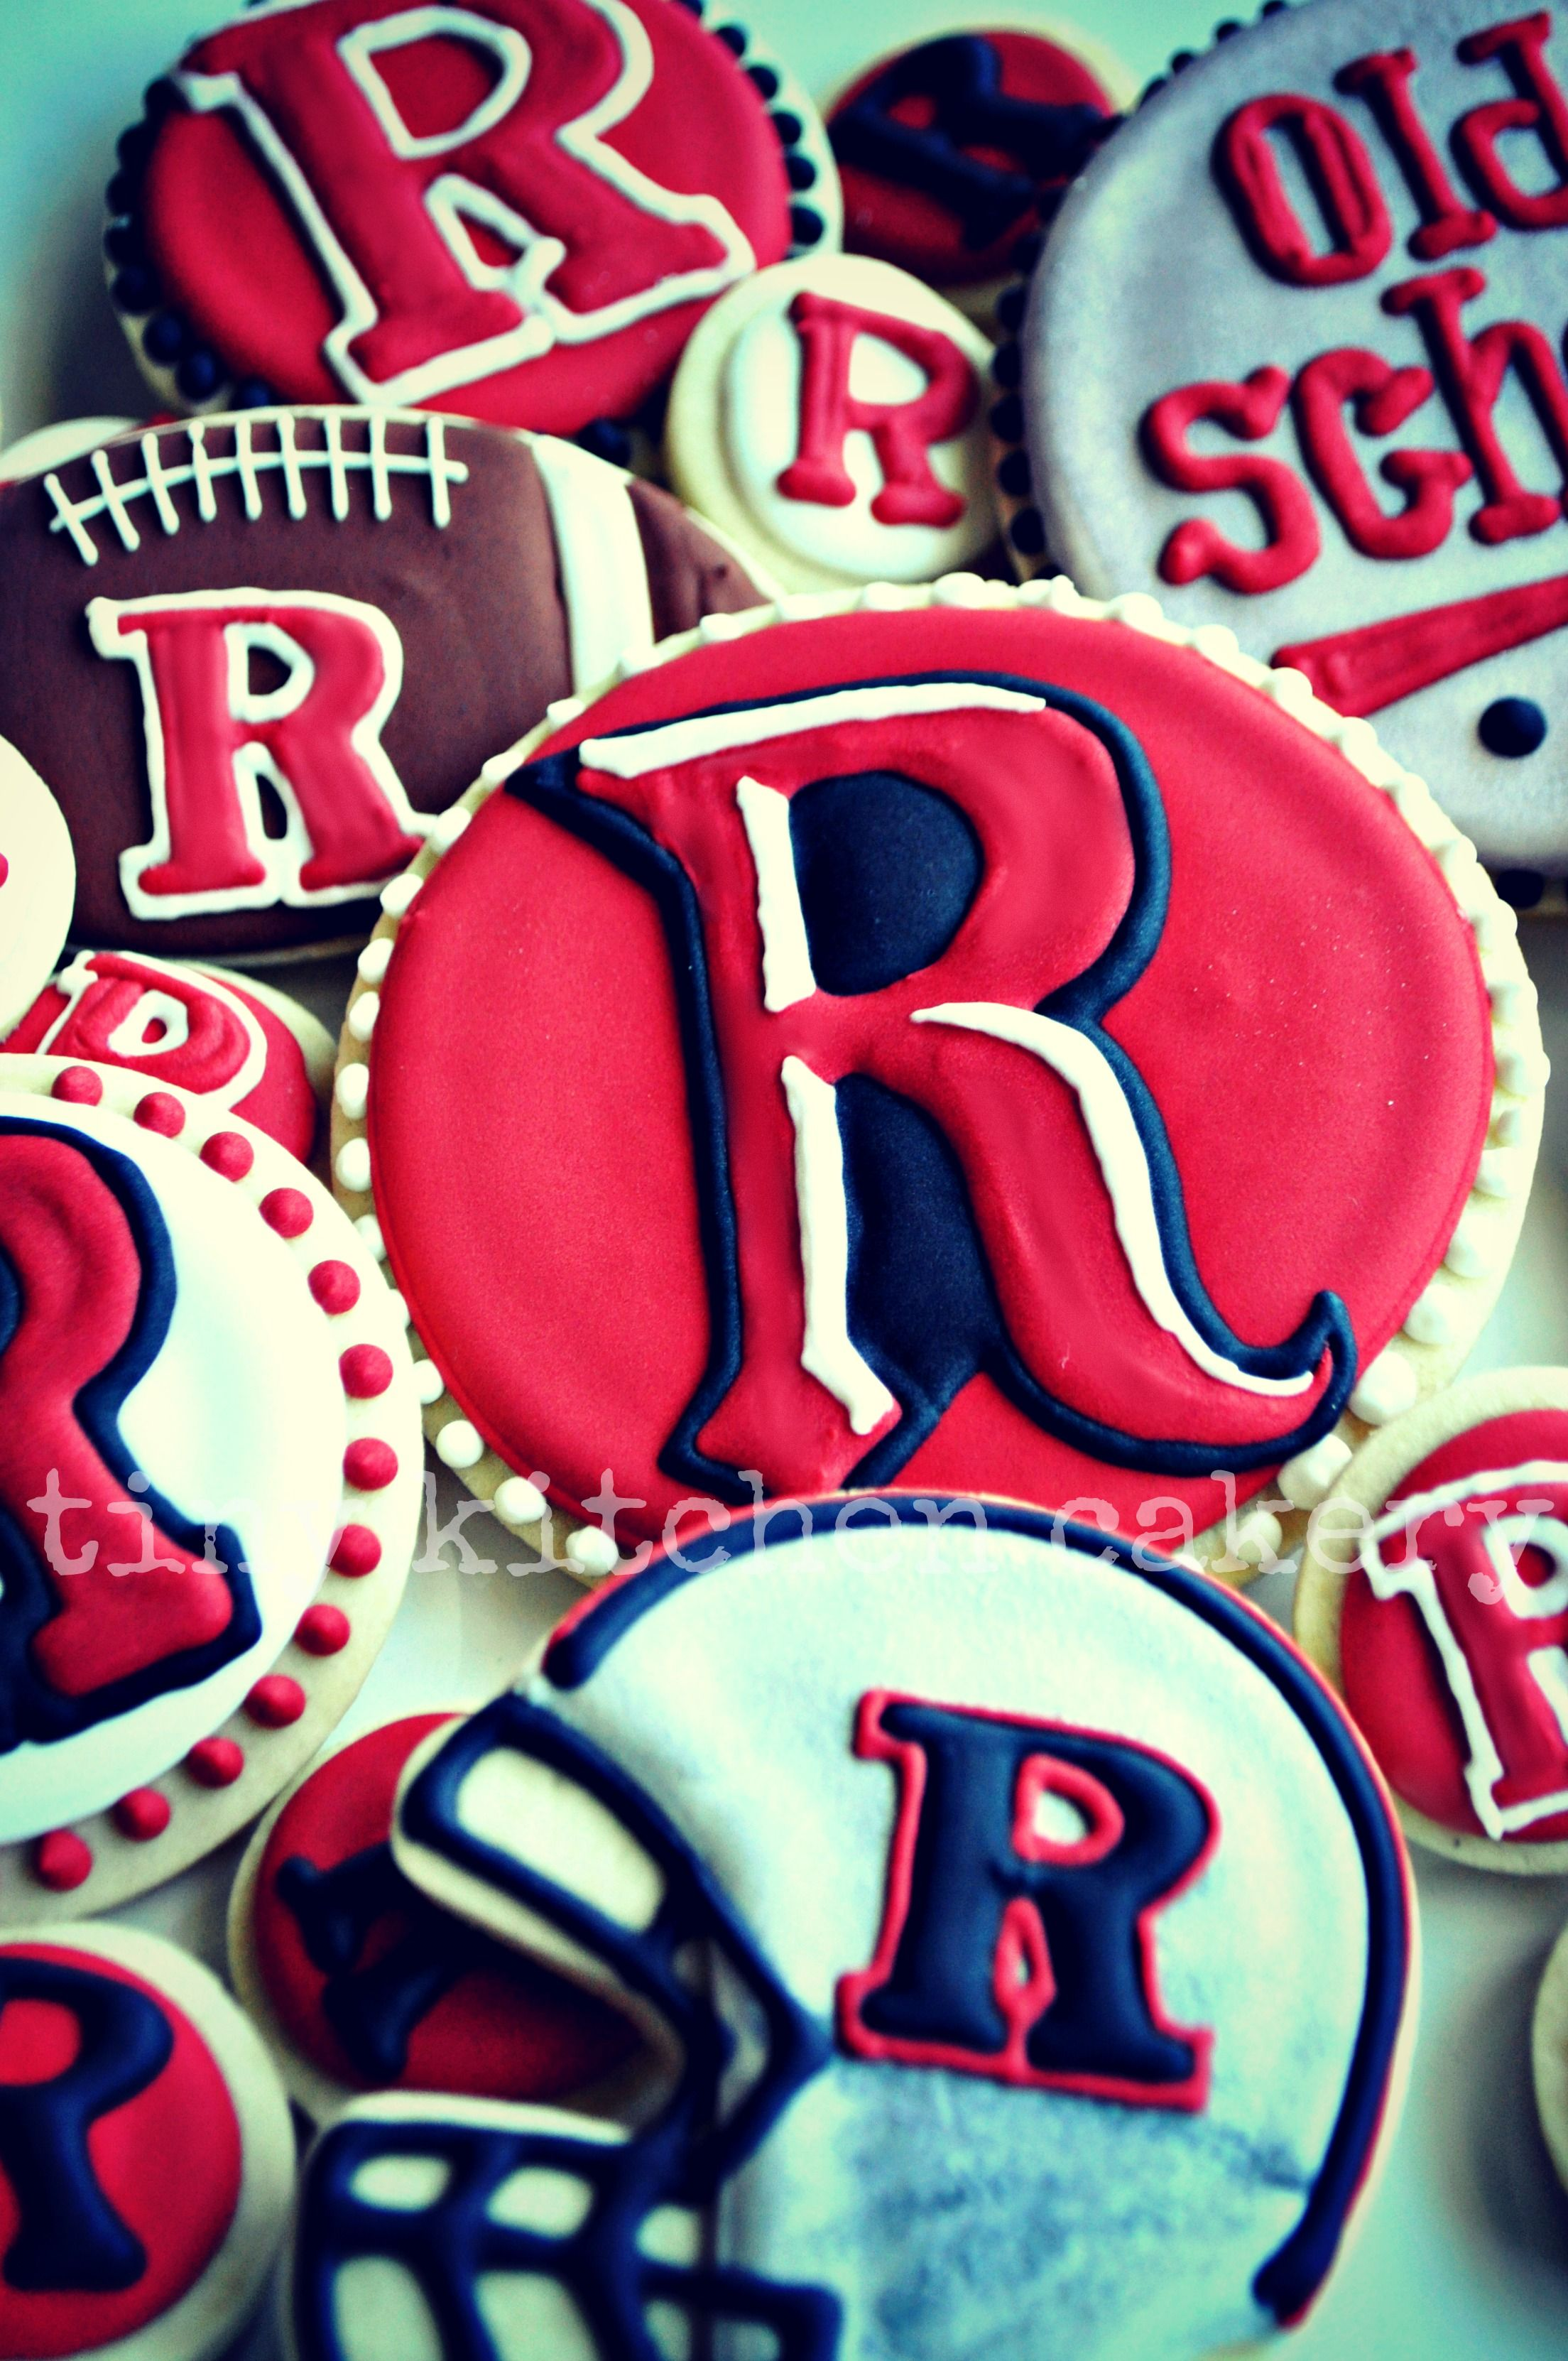 Rutgers Football Cookies Www Facebook Com Tinykitchencakery Football Cookies Rutgers Football Sugar Cookies Decorated